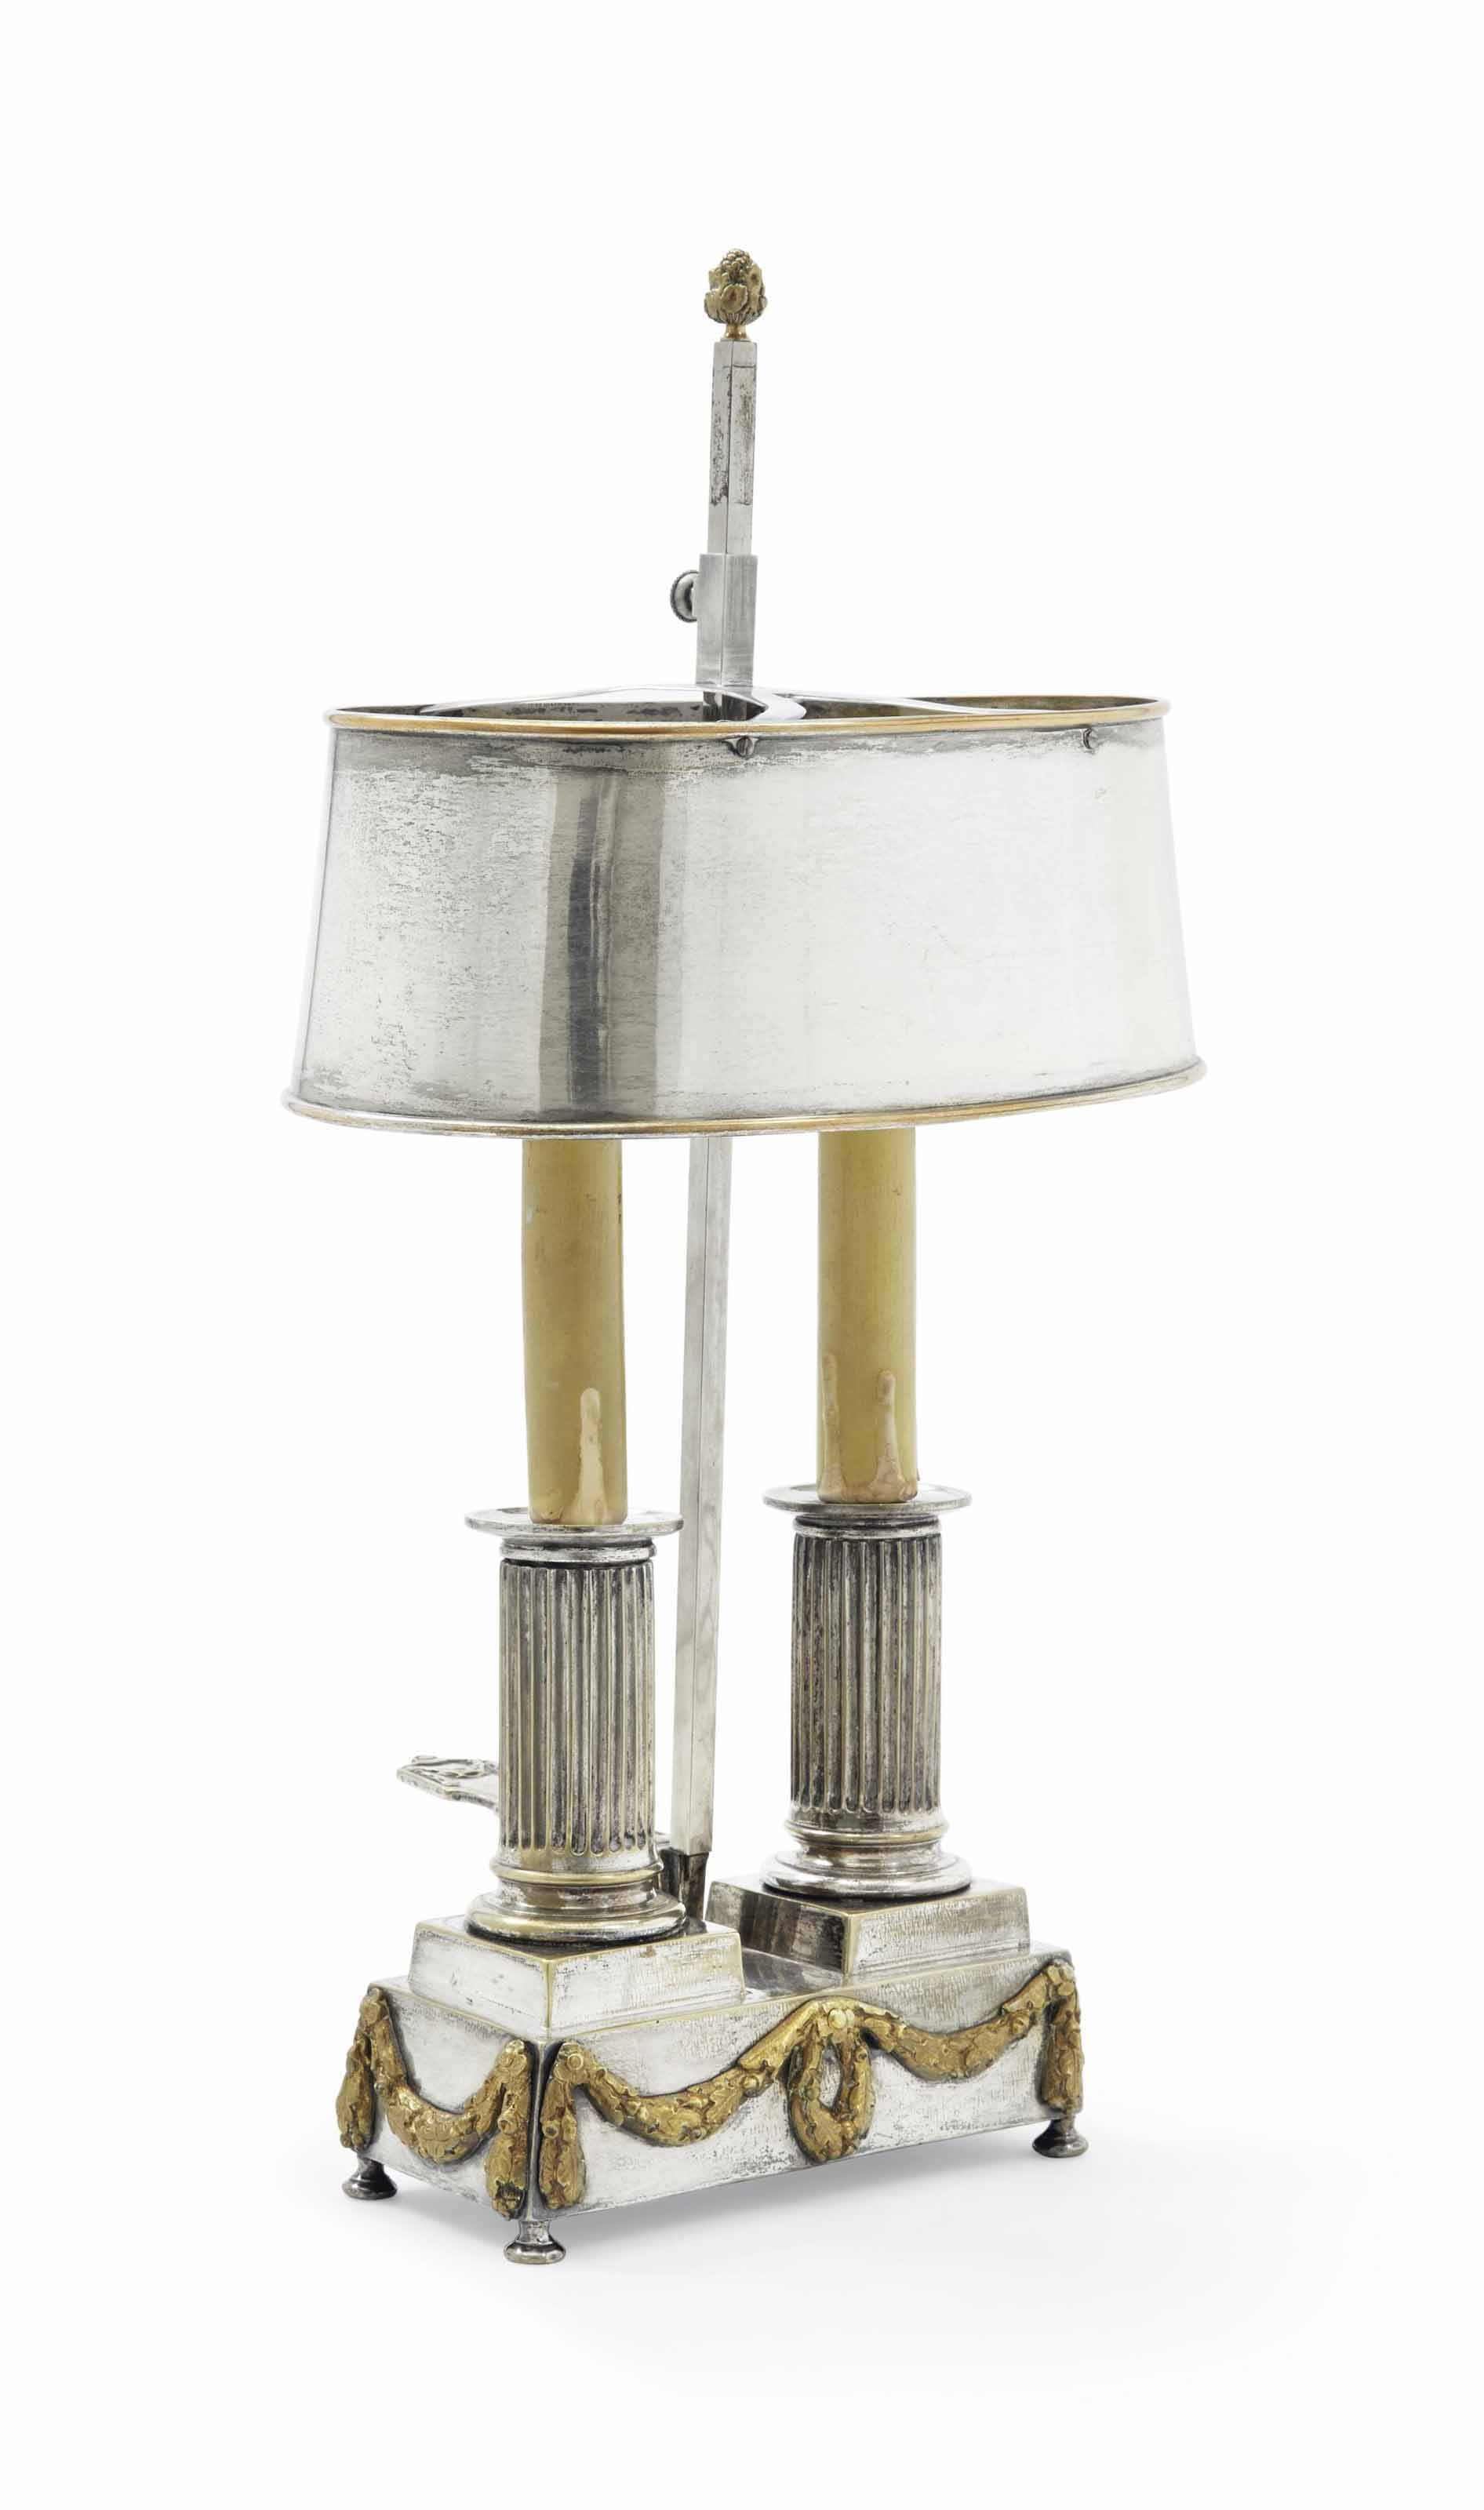 LAMPE EN METAL ARGENTE ET DORE